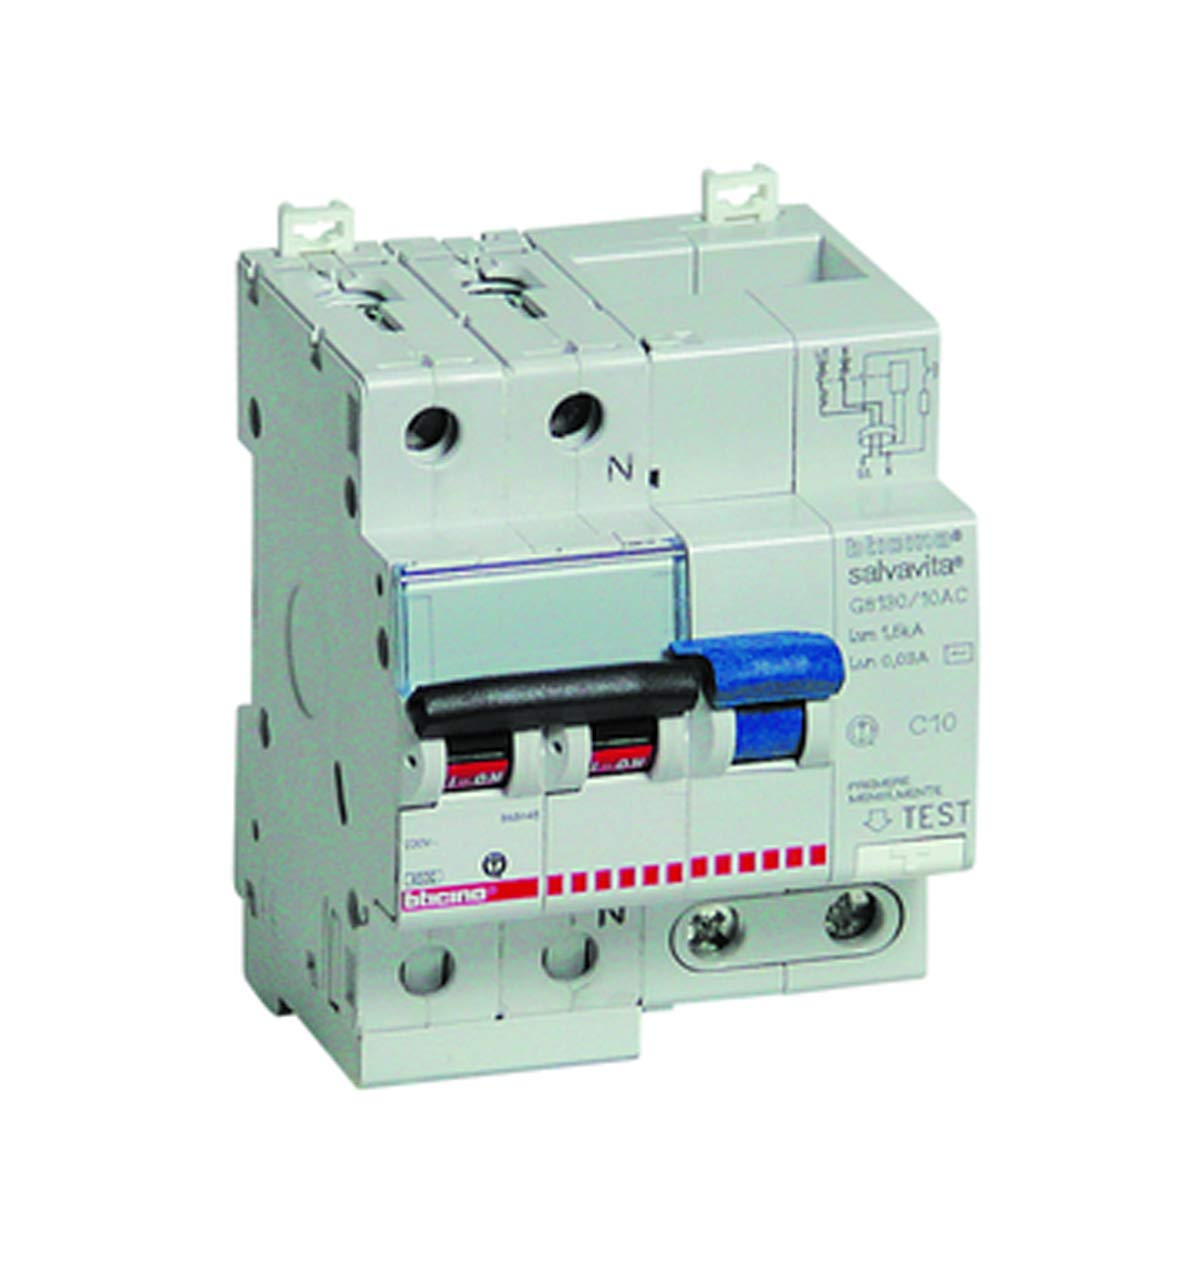 Interruttore magnetotermico differenziale 1P+N, Tipo C, 25A - BTICINO LEGRAND G8130/25AC